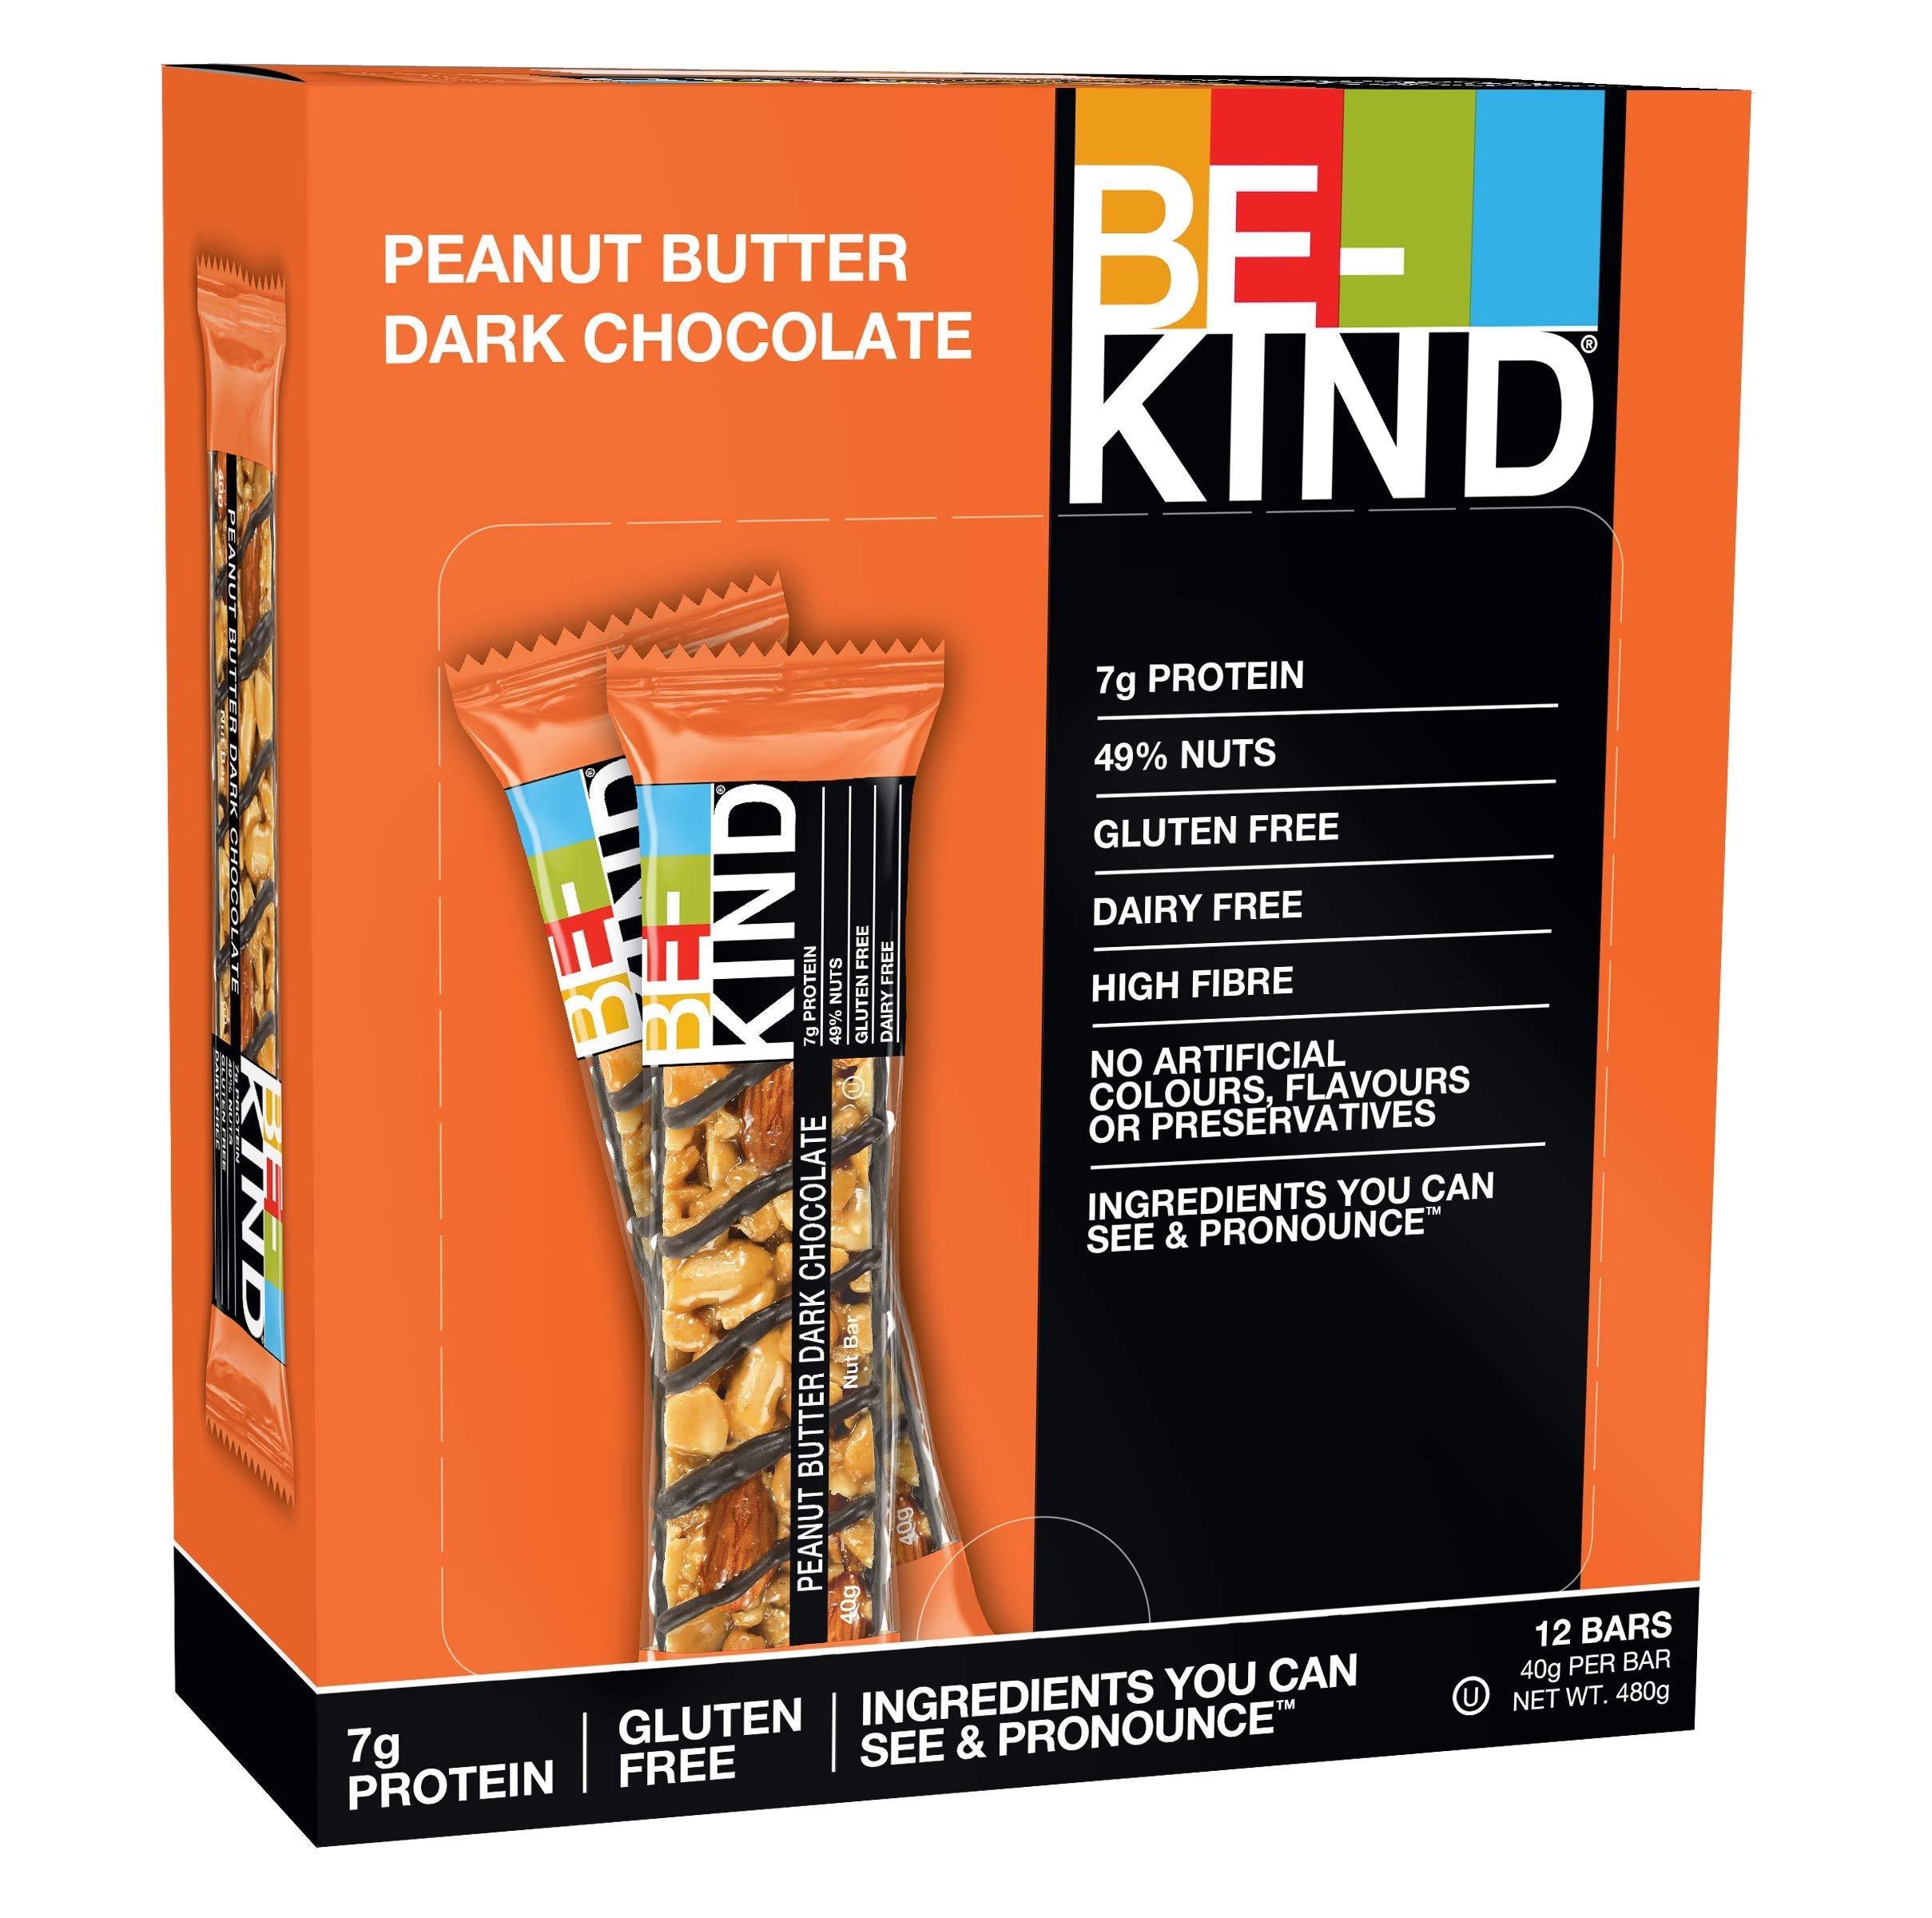 BE-KIND Snack al gusto - Barretta Senza Glutine - 12 barrette x 40g 1 spesavip